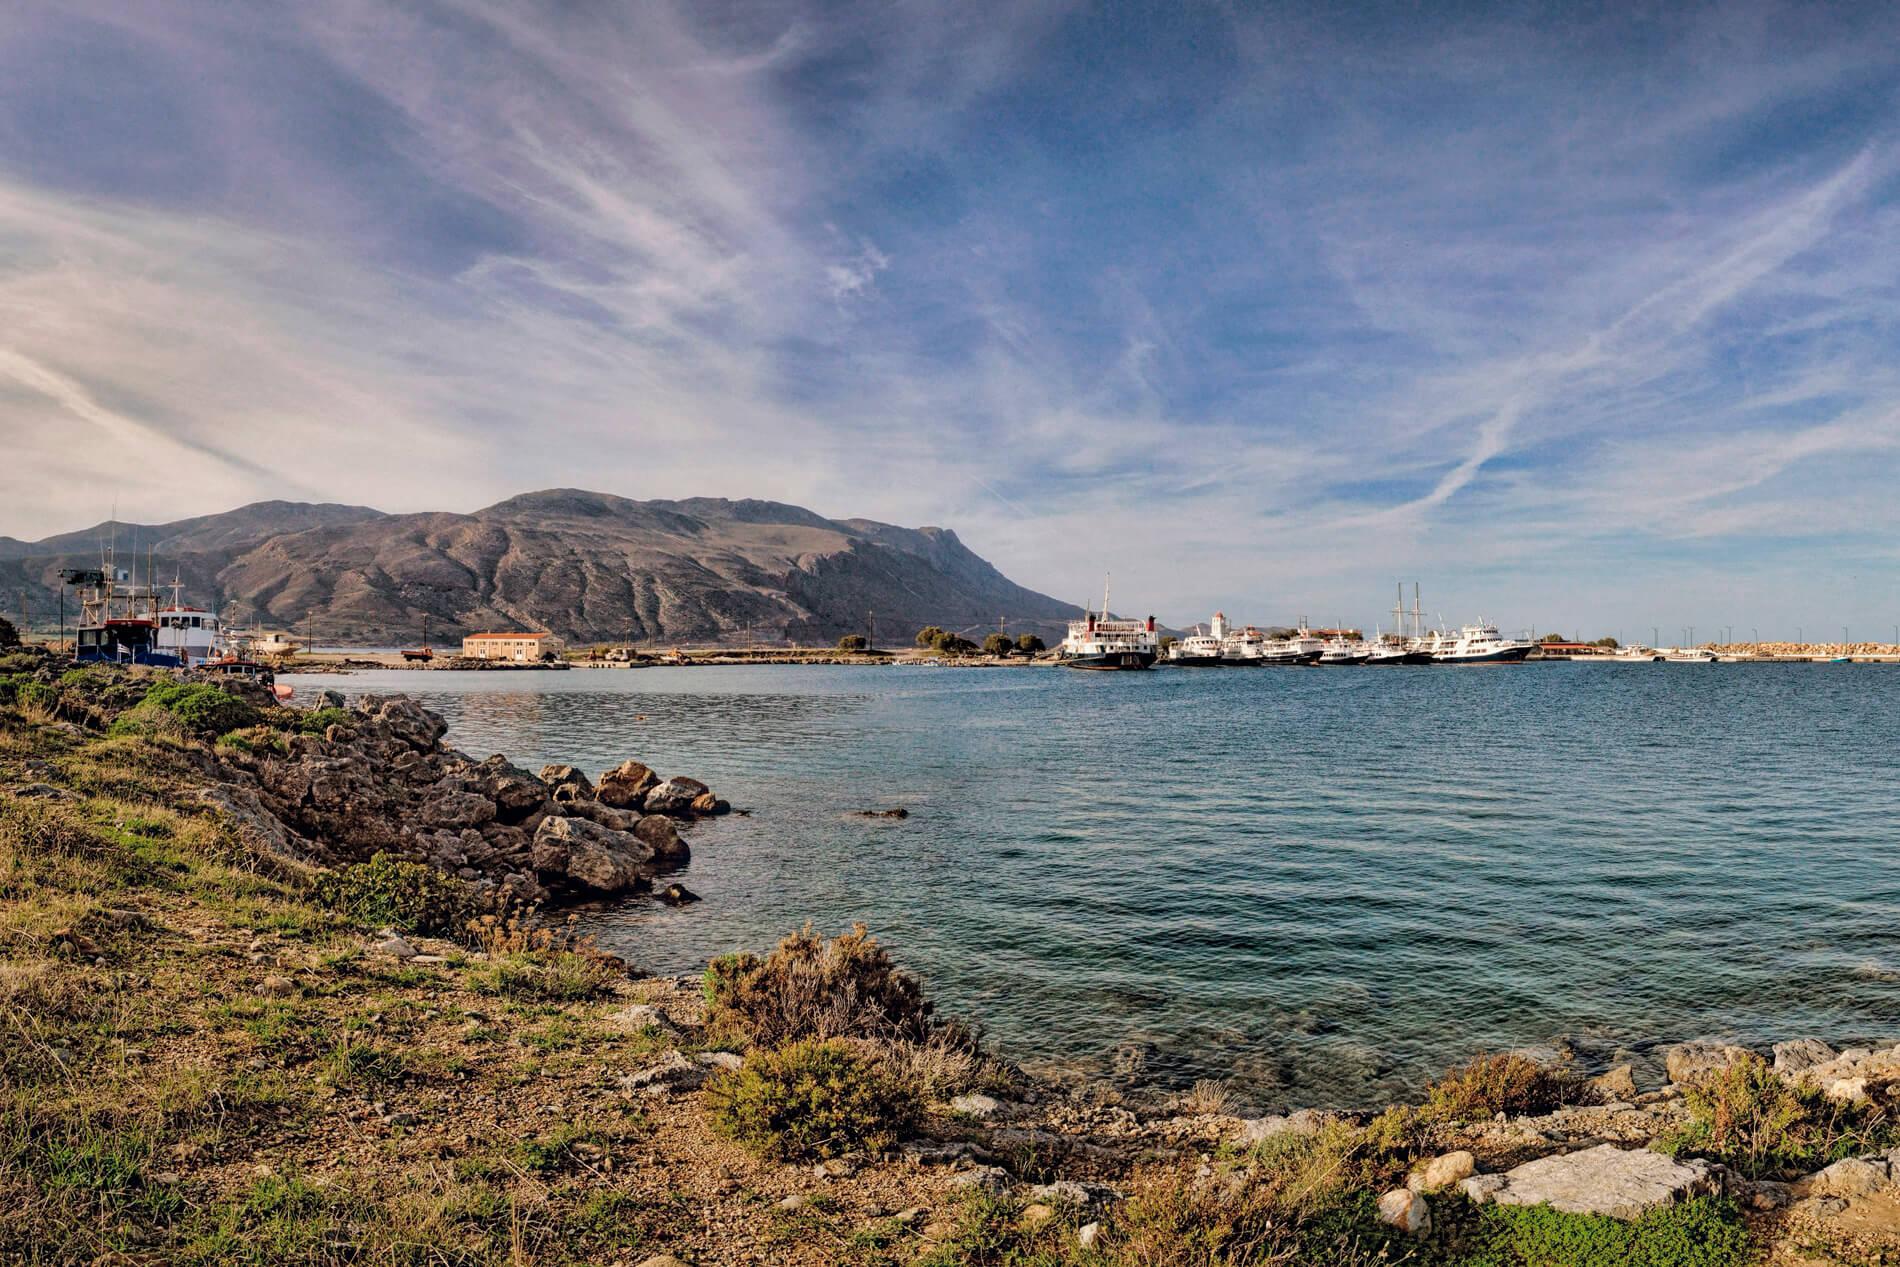 Elite Crete - Luxury Tourism in Chania, Crete - Kissamos